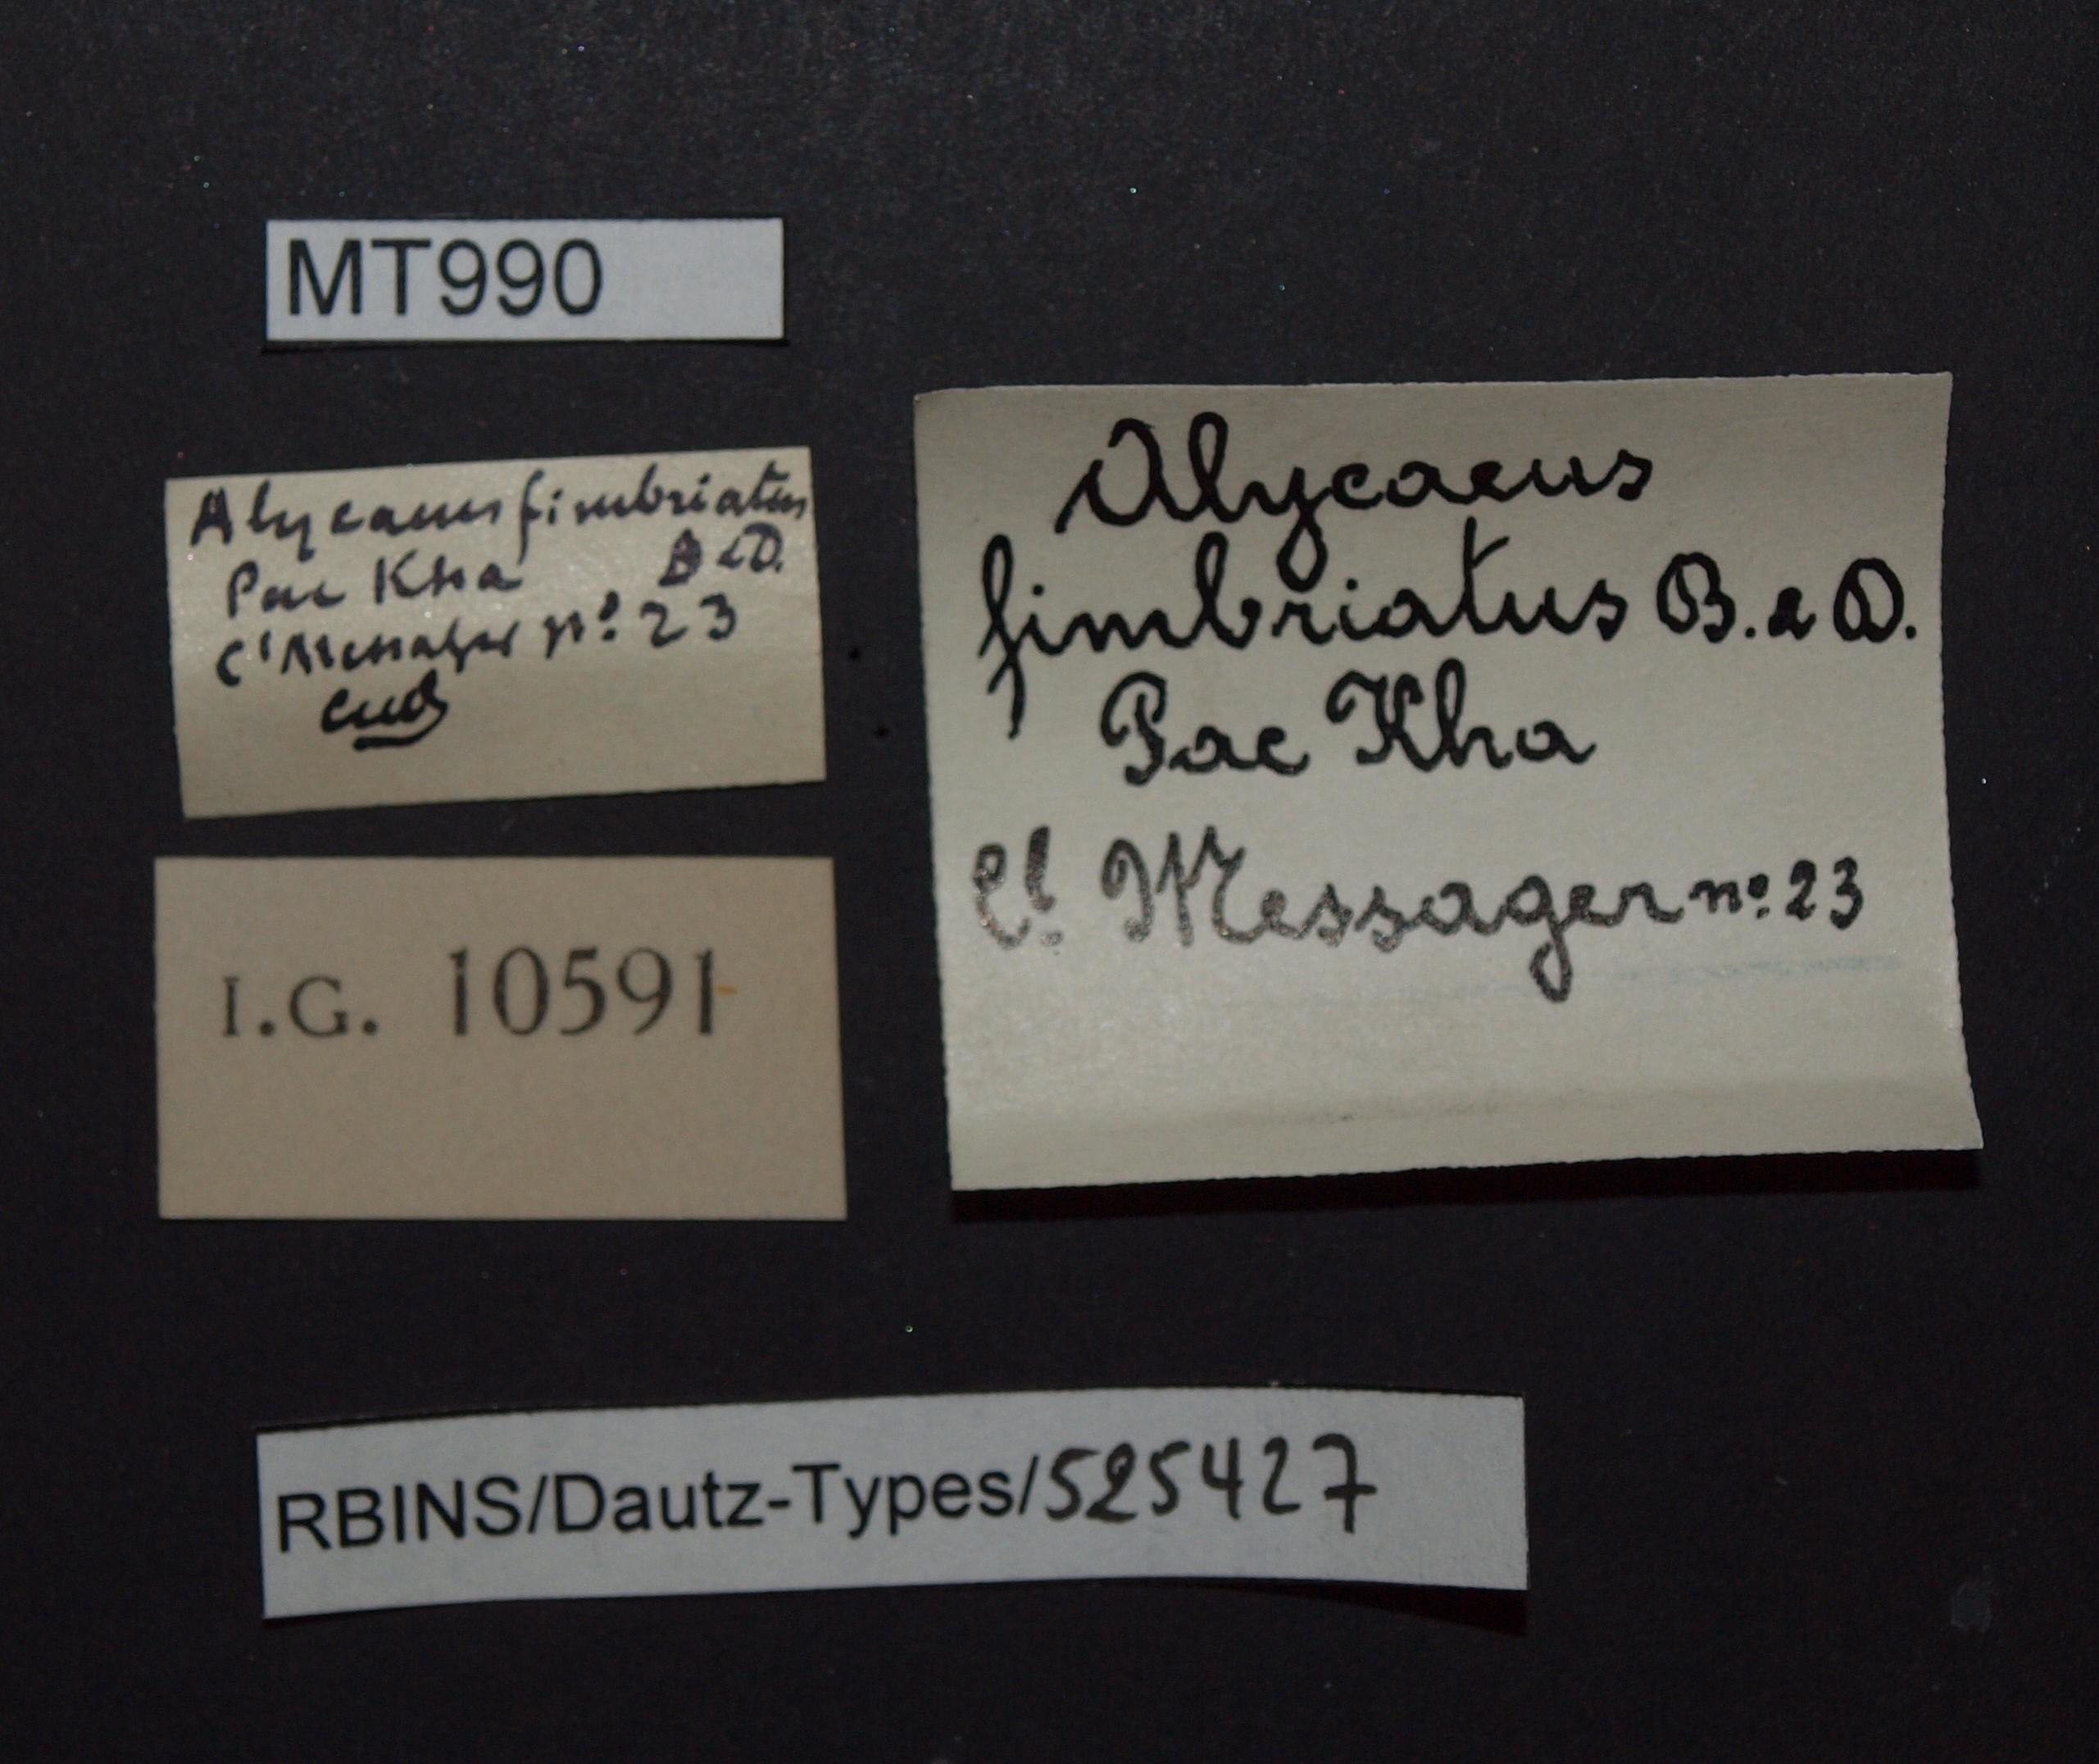 BE-RBINS-INV MT 990 Alycaeus (Charax) fimbriatus pt Lb.JPG